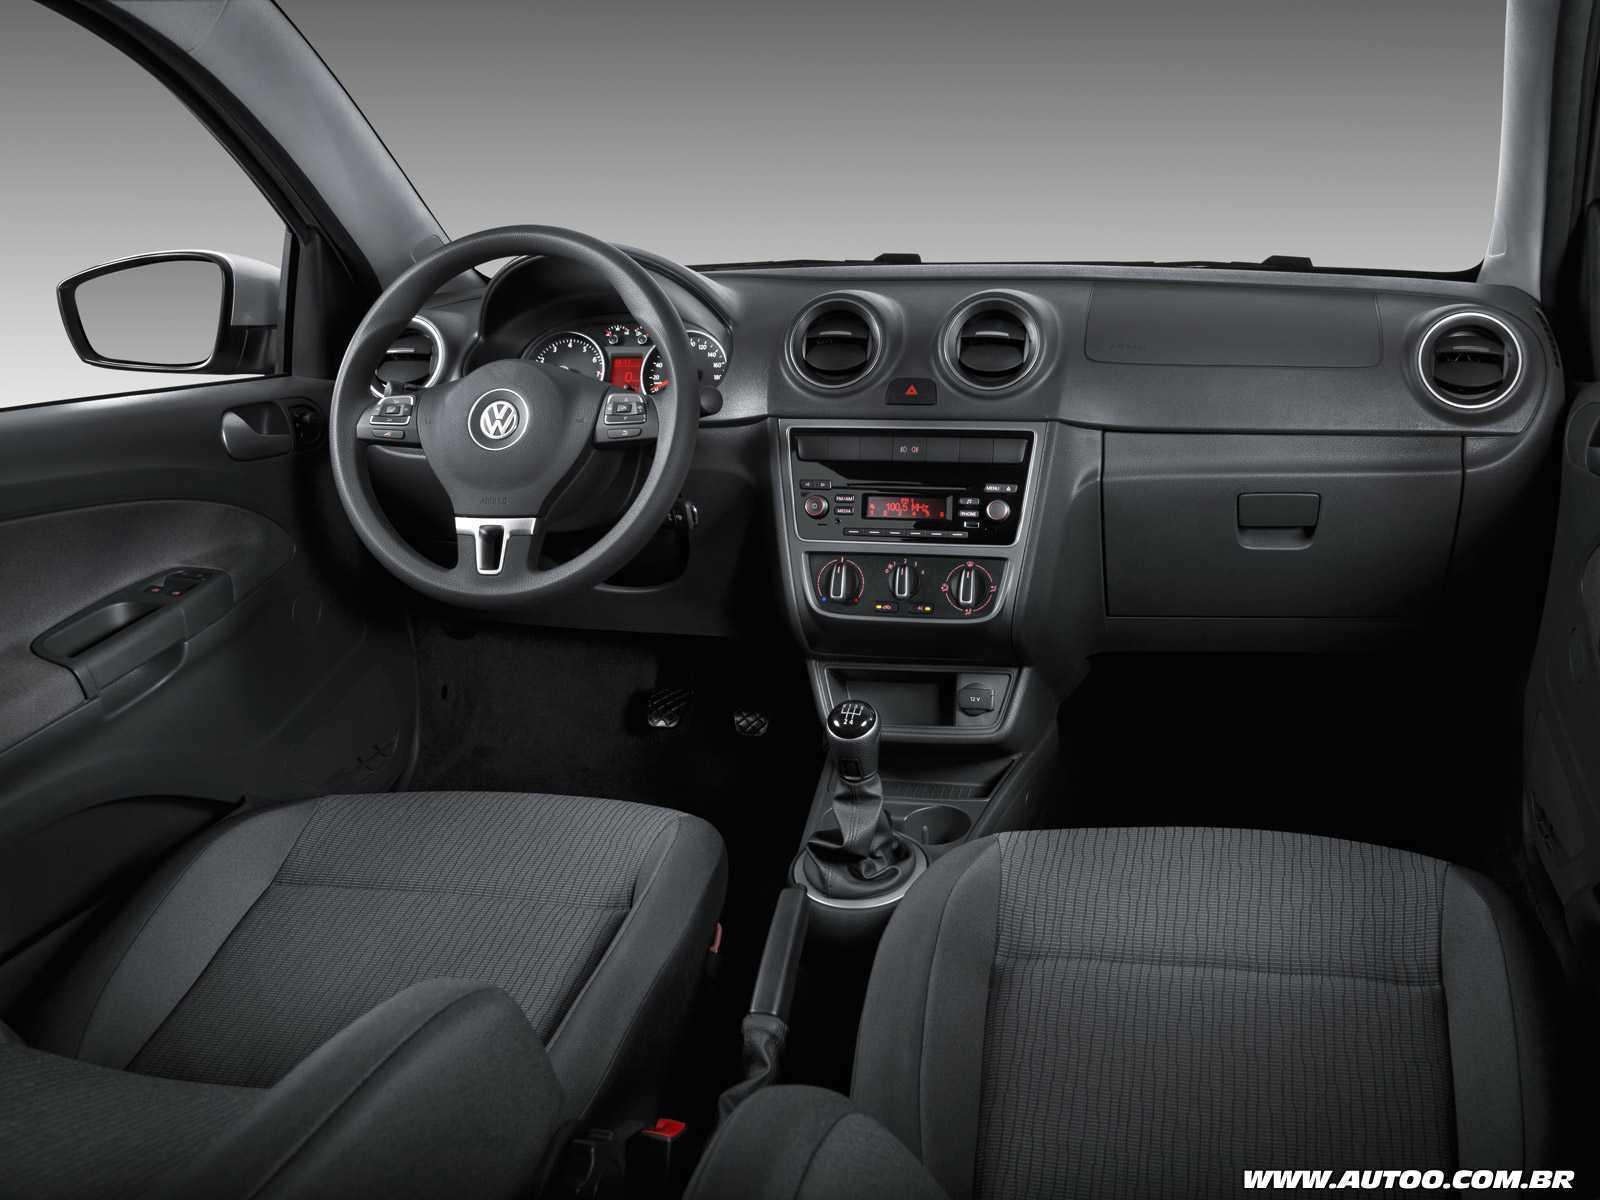 VolkswagenGol 2016 - painel